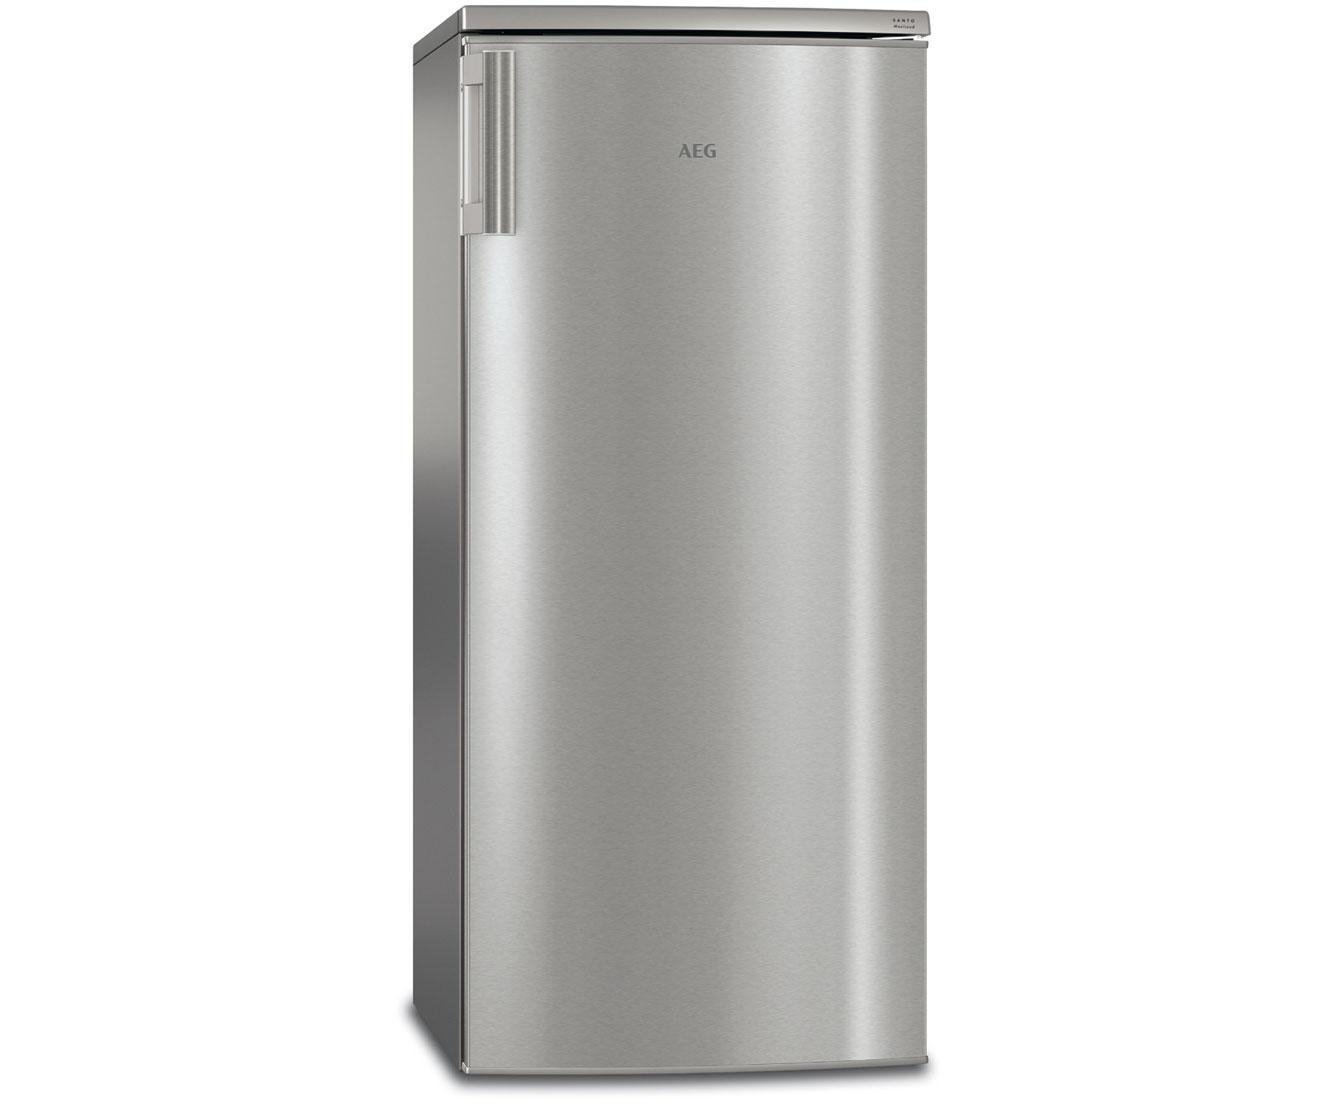 Aeg Santo Unterbau Kühlschrank : Aeg santo rfb ax kühlschrank mit gefrierfach edelstahl a